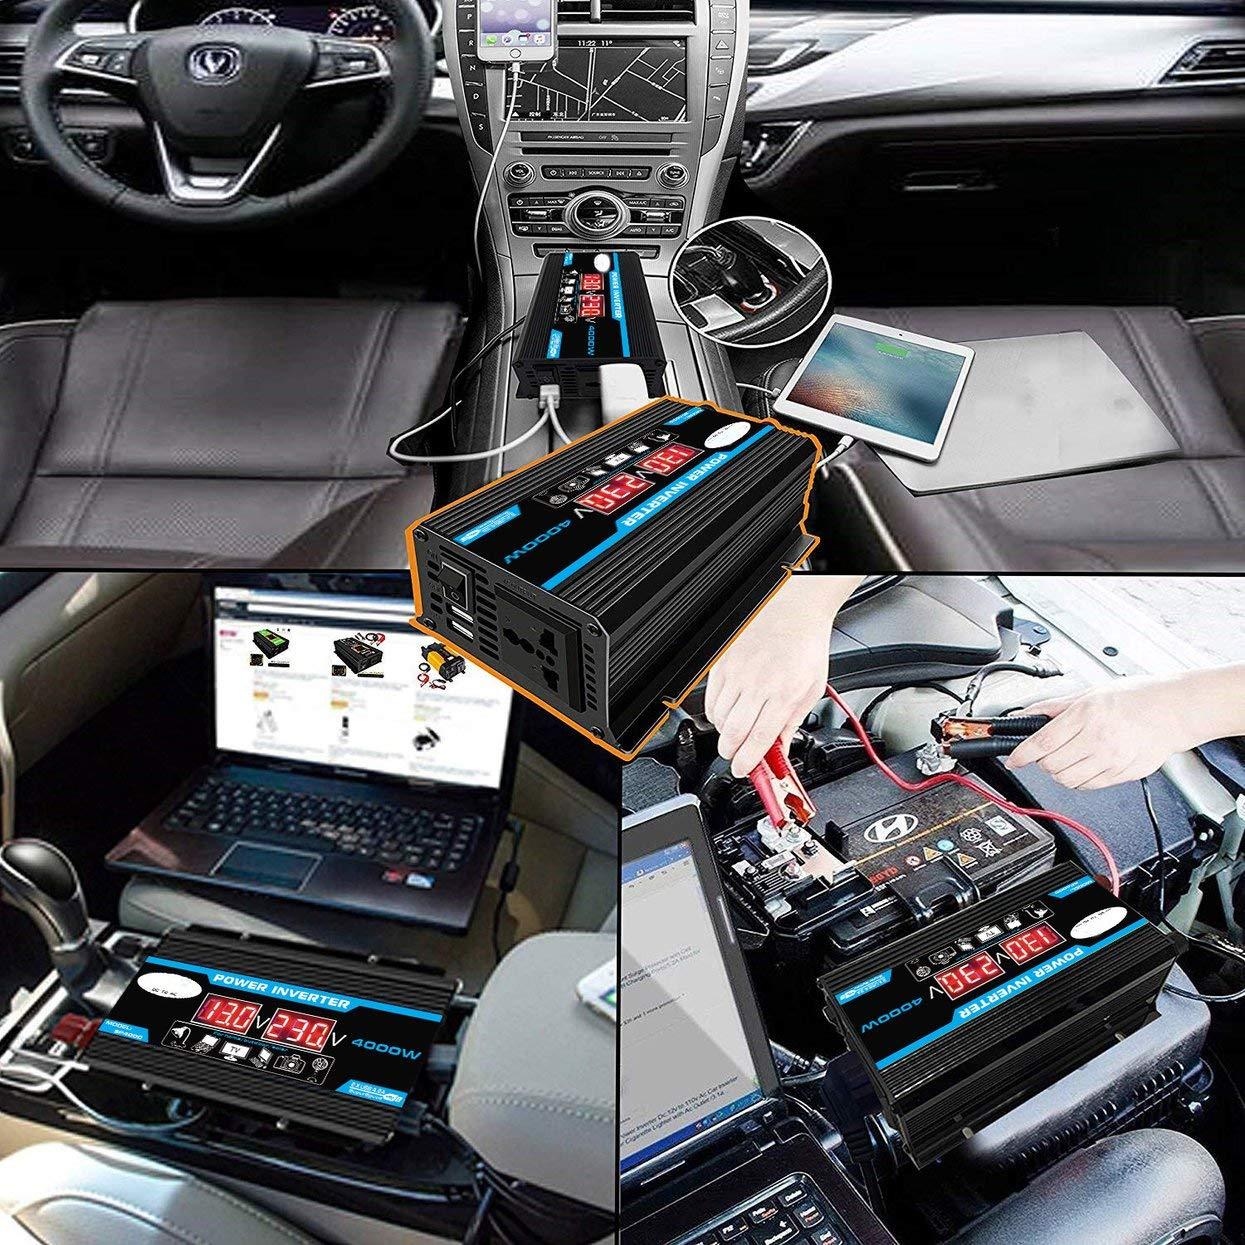 Negro 4000W 12V a 220V 110V LED Adaptador de Cargador de convertidor de inversor de Corriente para autom/óvil Transformador de Voltaje USB Dual Onda sinusoidal modificada